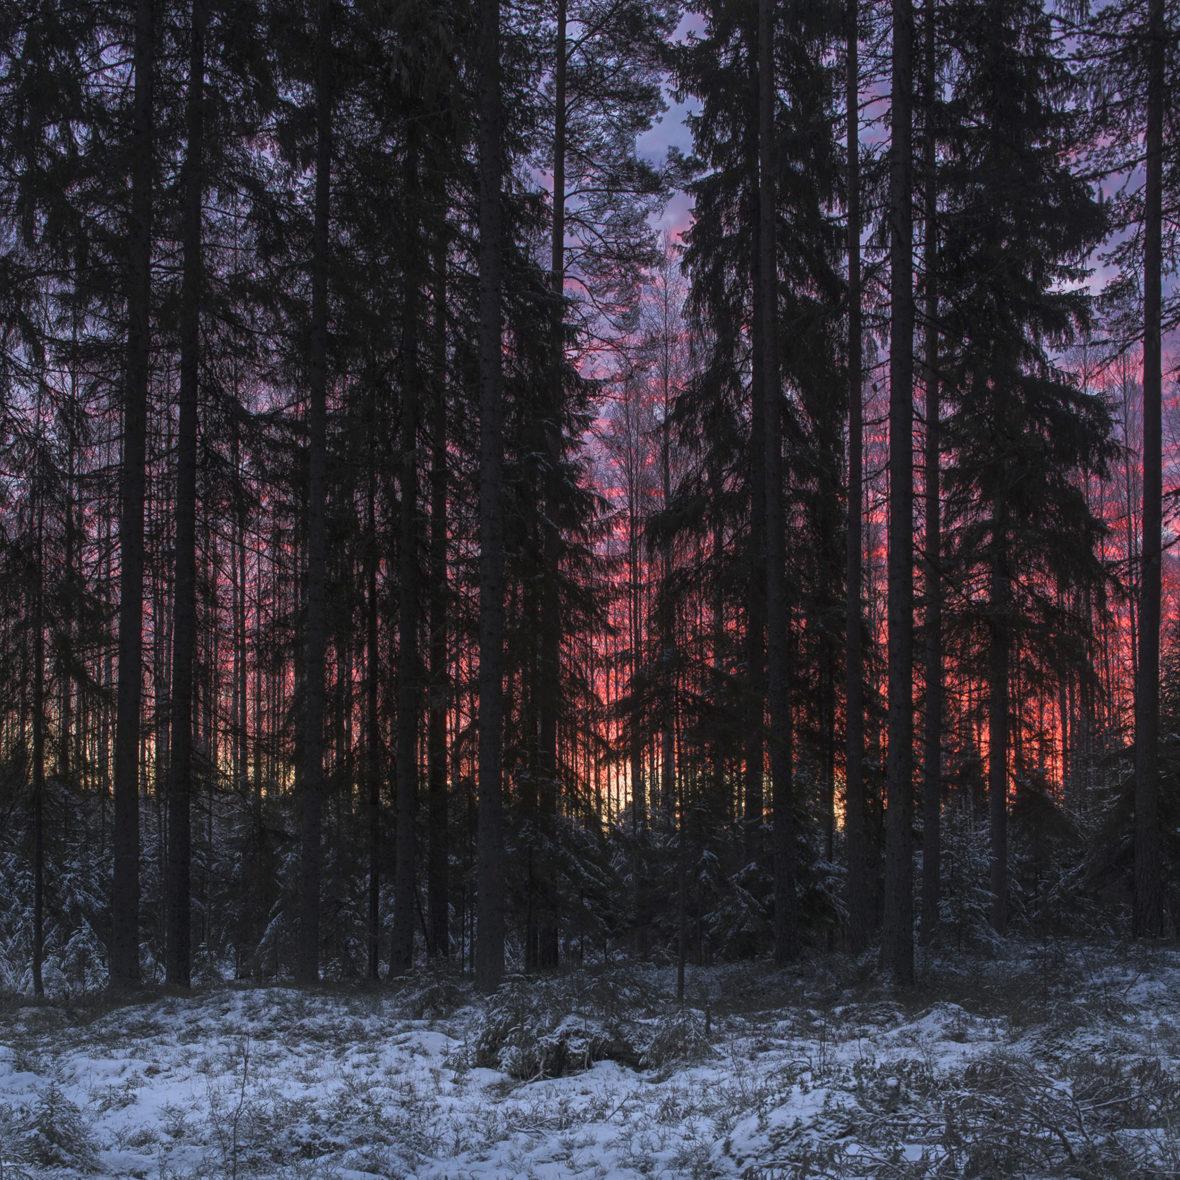 Helmikuun aamu /February Morning